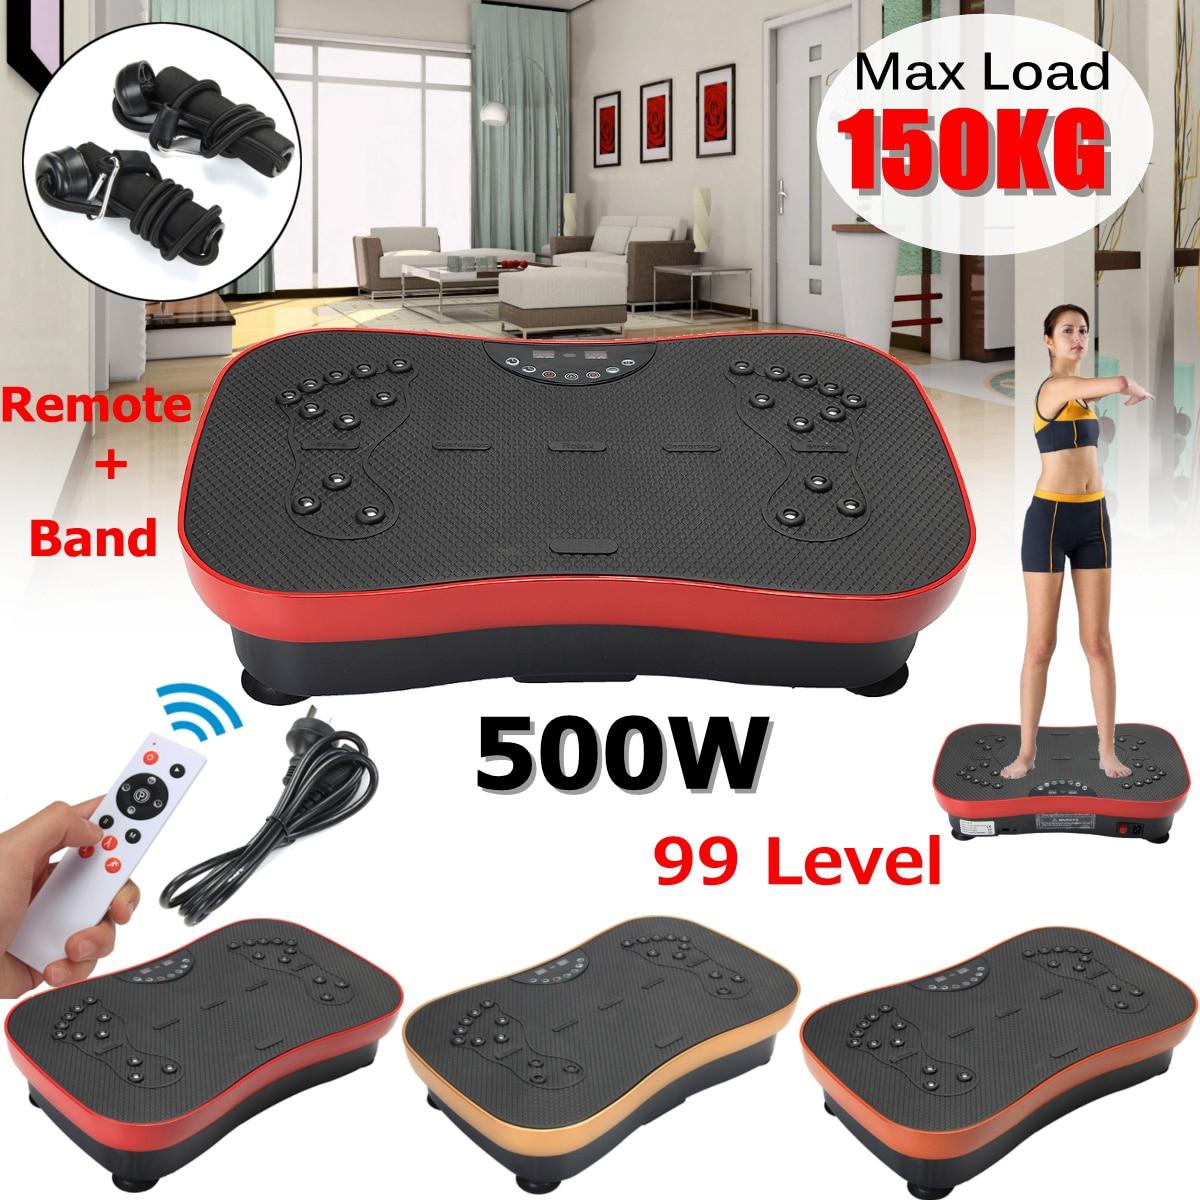 150KG/330lb Exercise Fitness Slim Vibration Machine Trainer Plate Platform Body Shaper With Resistance Bands